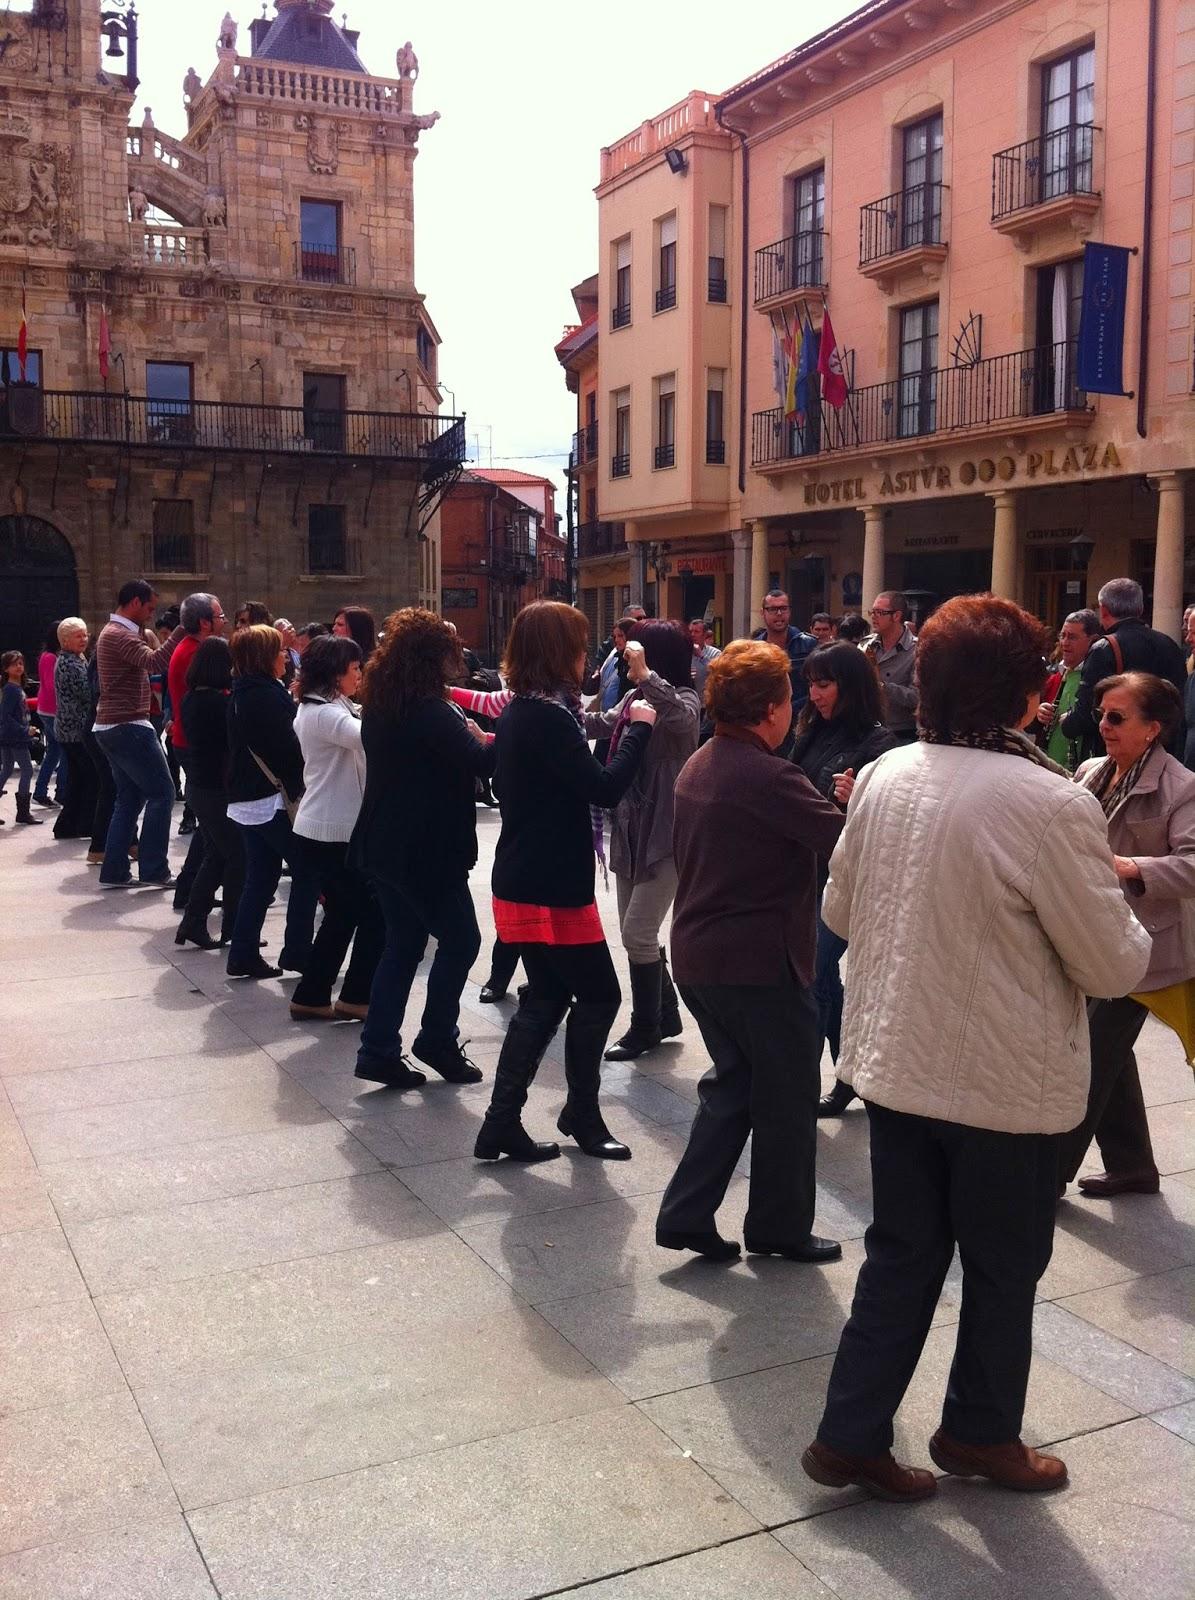 DON SANCHO. Difusión de la Cultura Tradicional de Zamora ... - photo#41